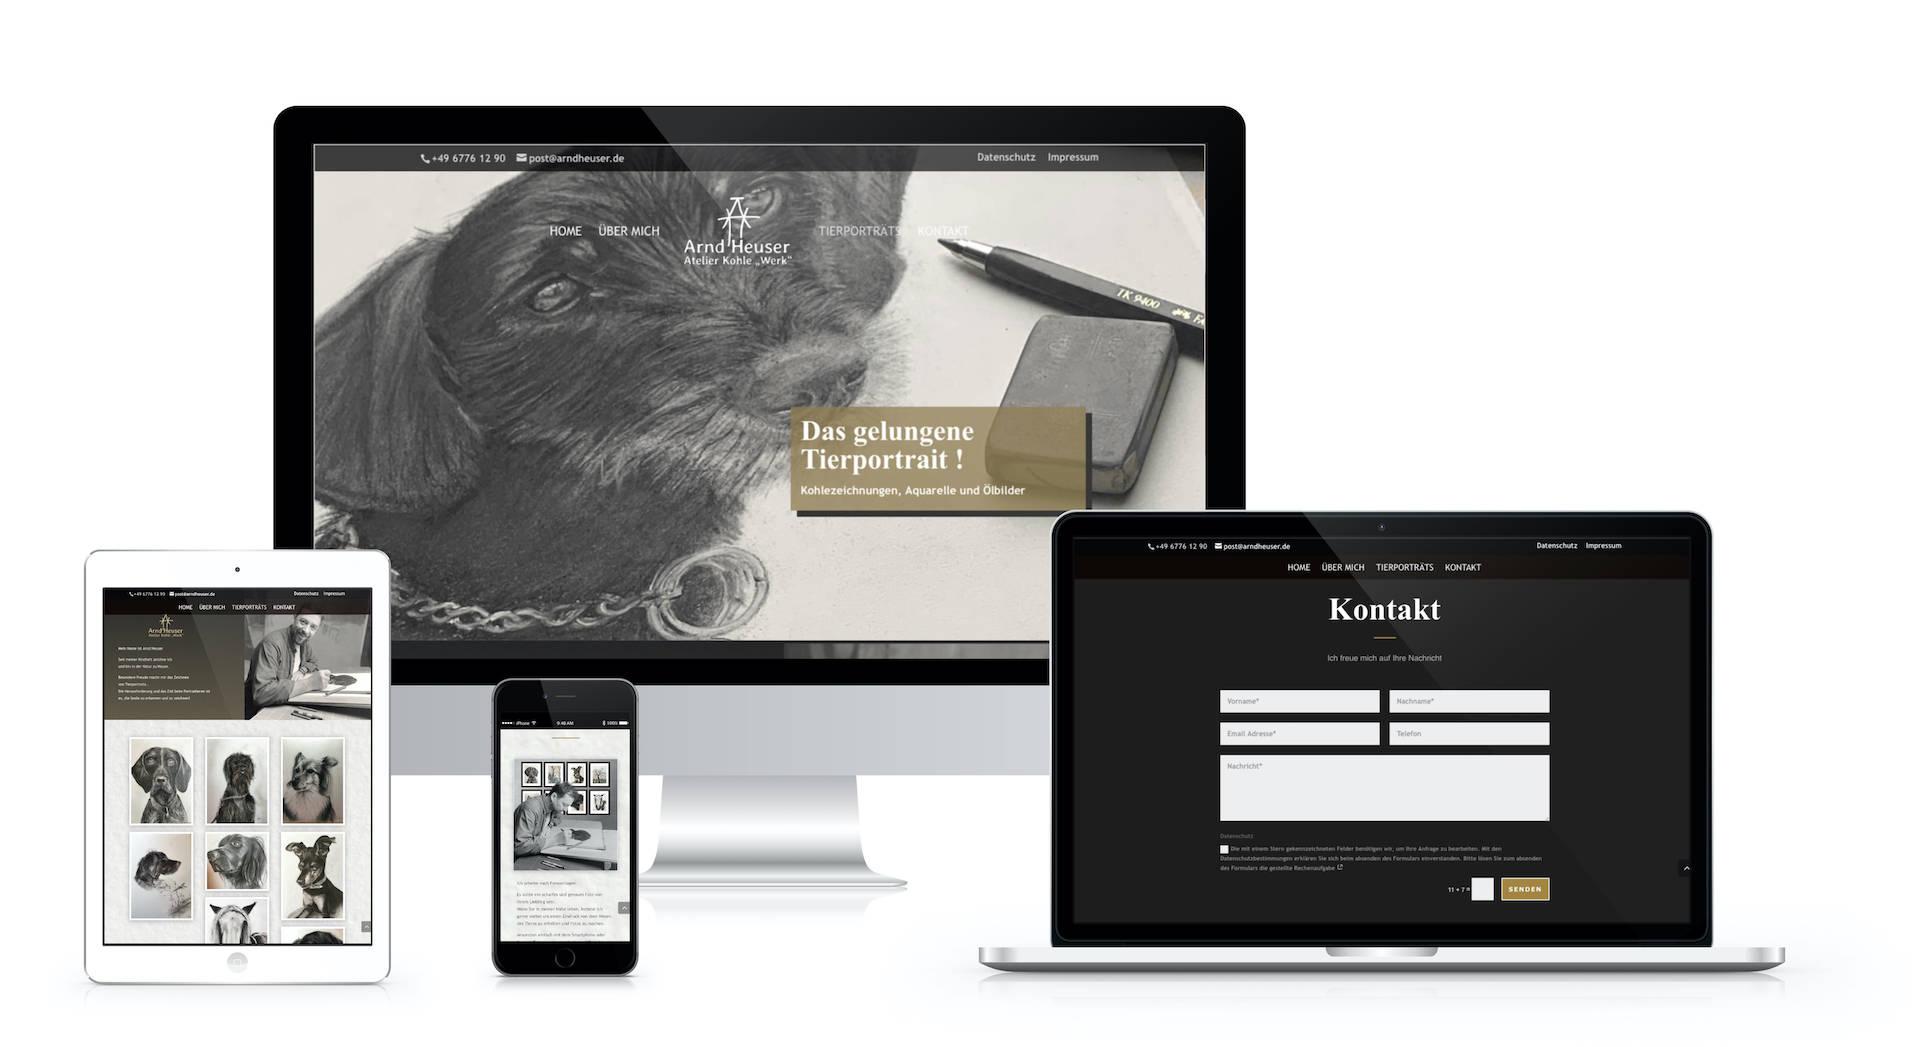 Webdesign Arnd Heuser